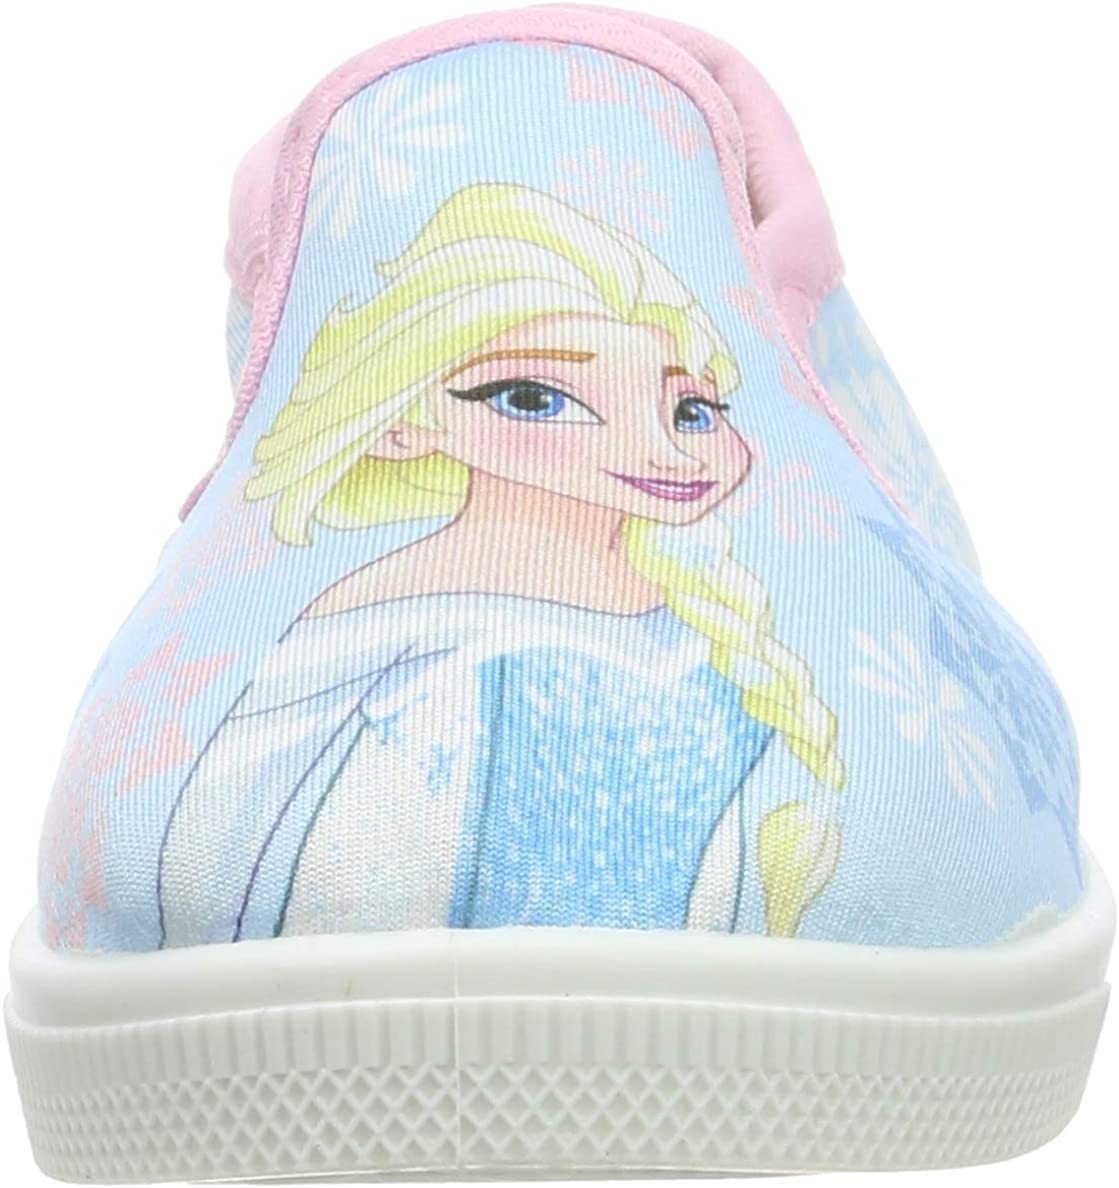 Die Eisk/önigin M/ädchen Girls Kids Slipon Sneakers Slip On Sneaker